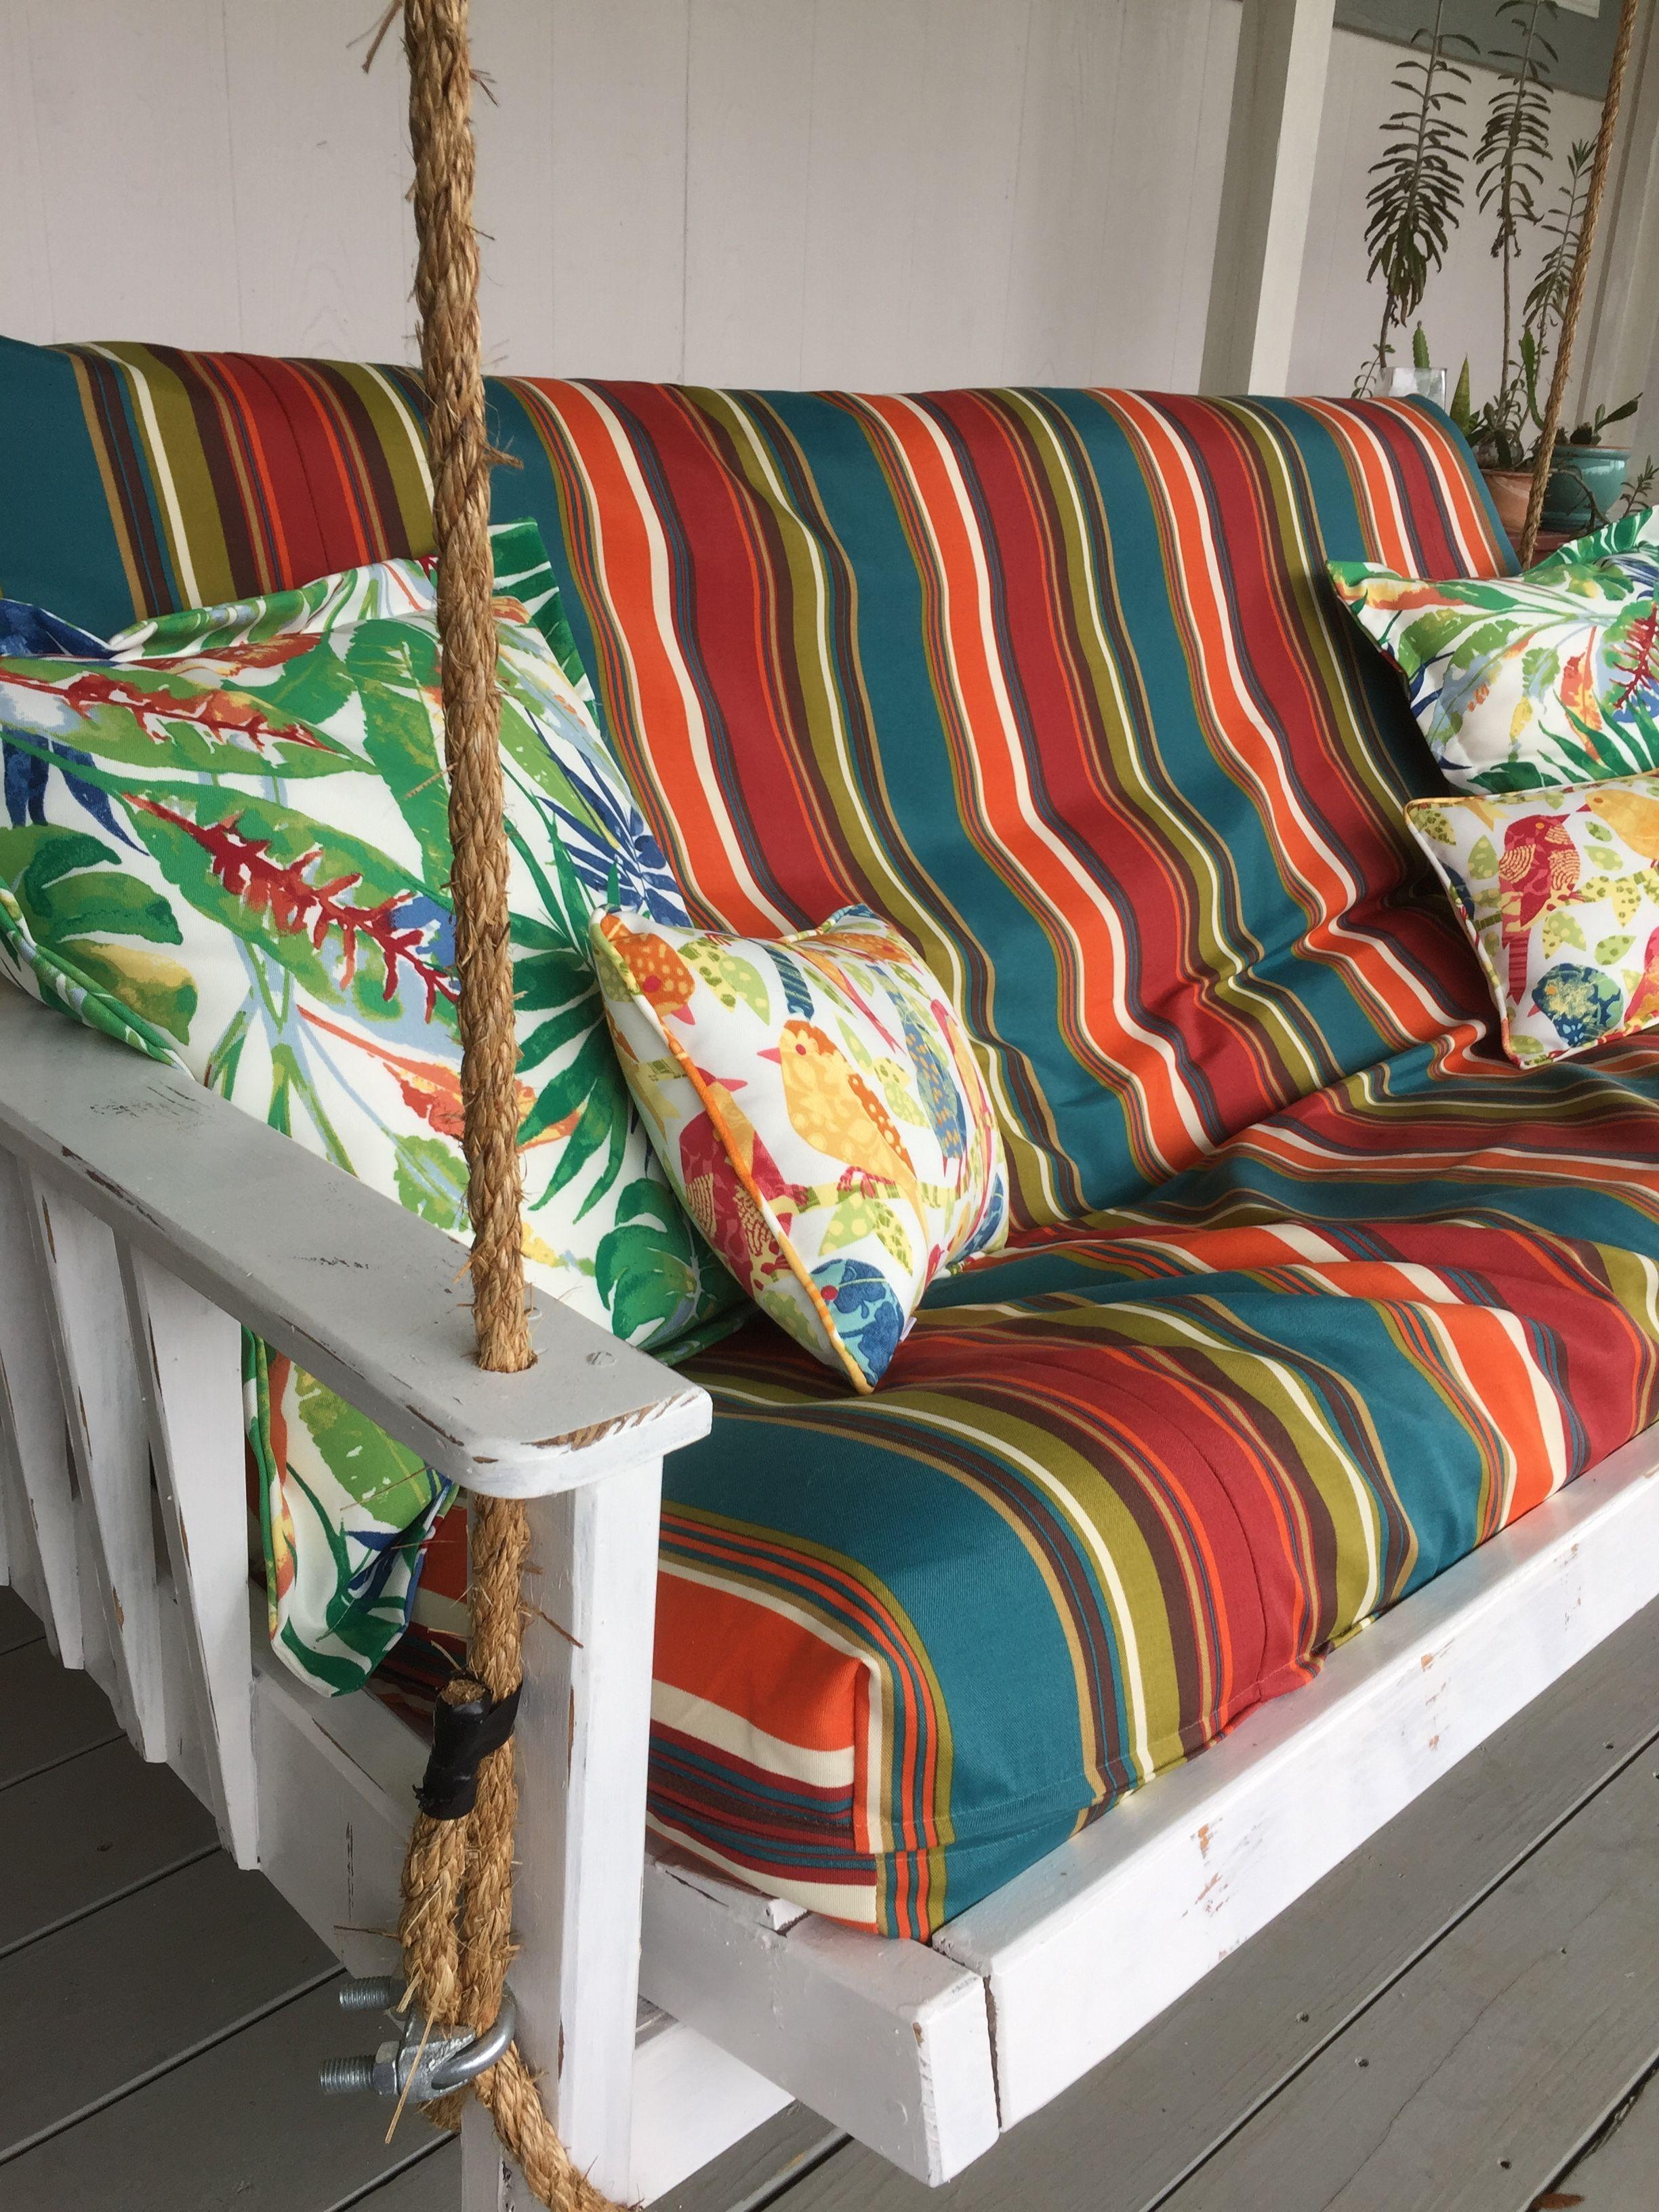 Stupefying cool ideas futon kids chairs futon living room basements